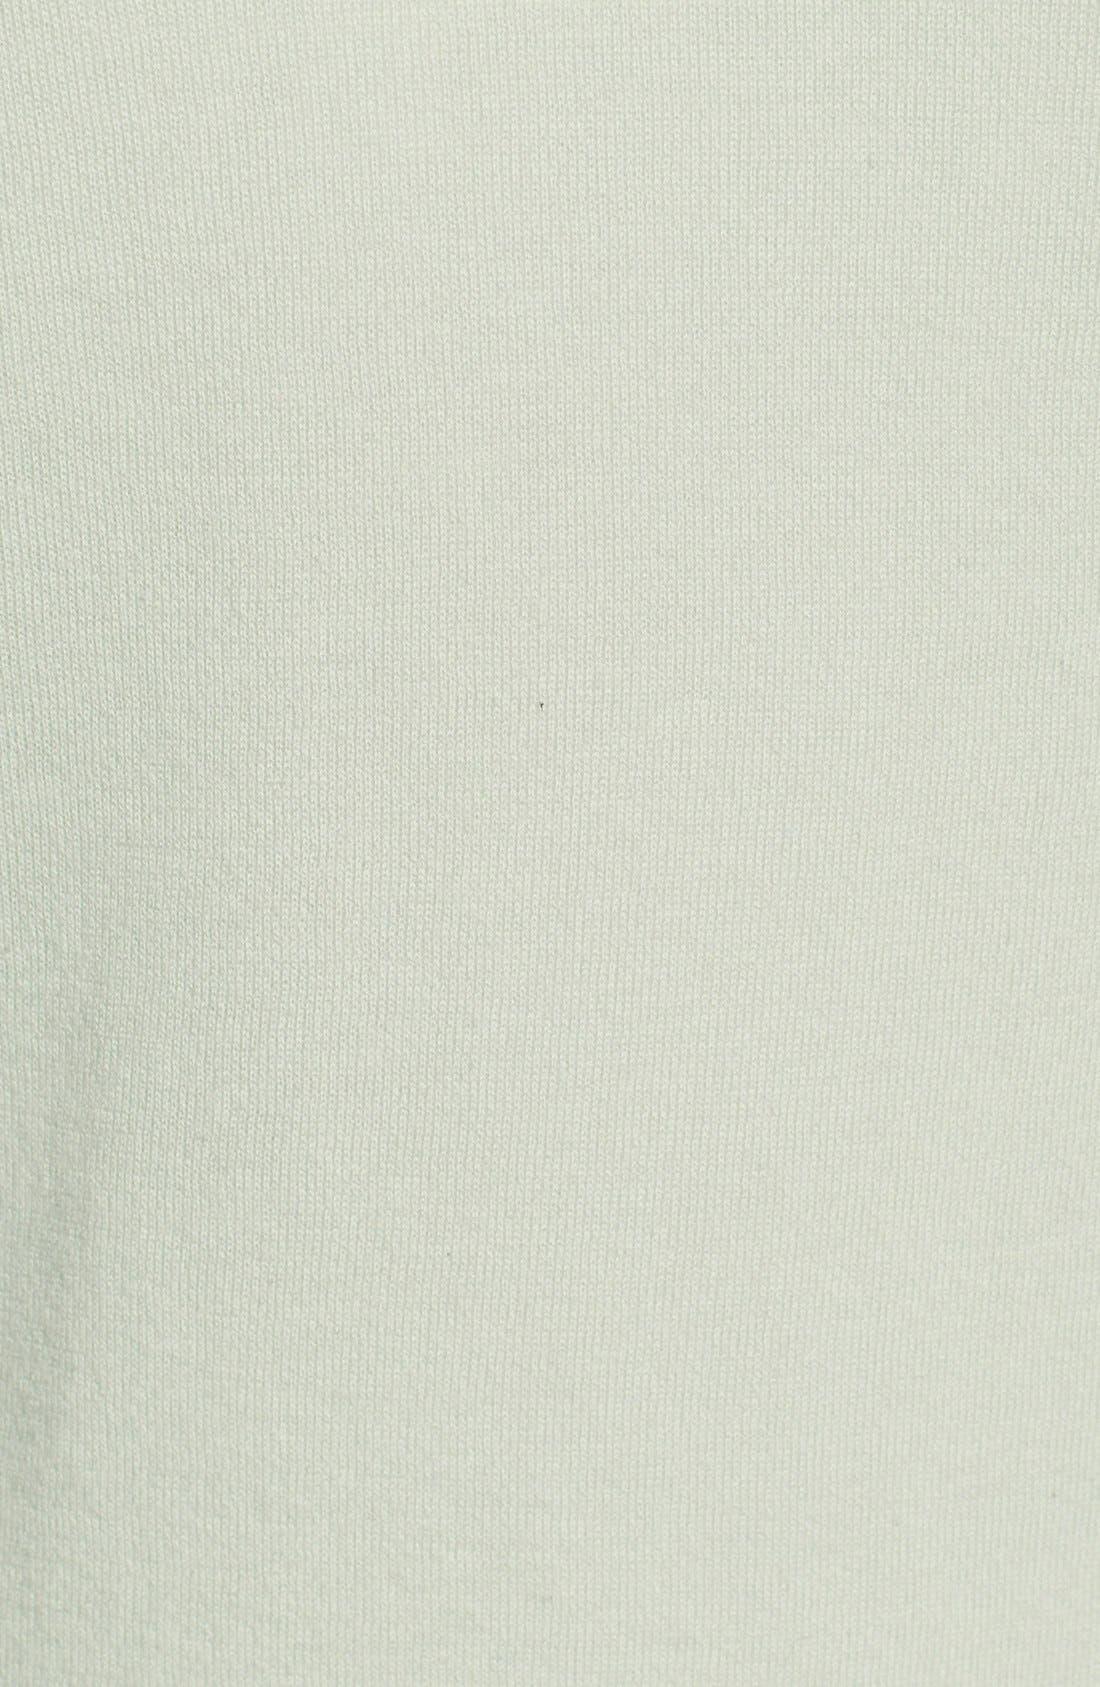 Alternate Image 3  - Tory Burch 'Michaela' Cashmere Sweater